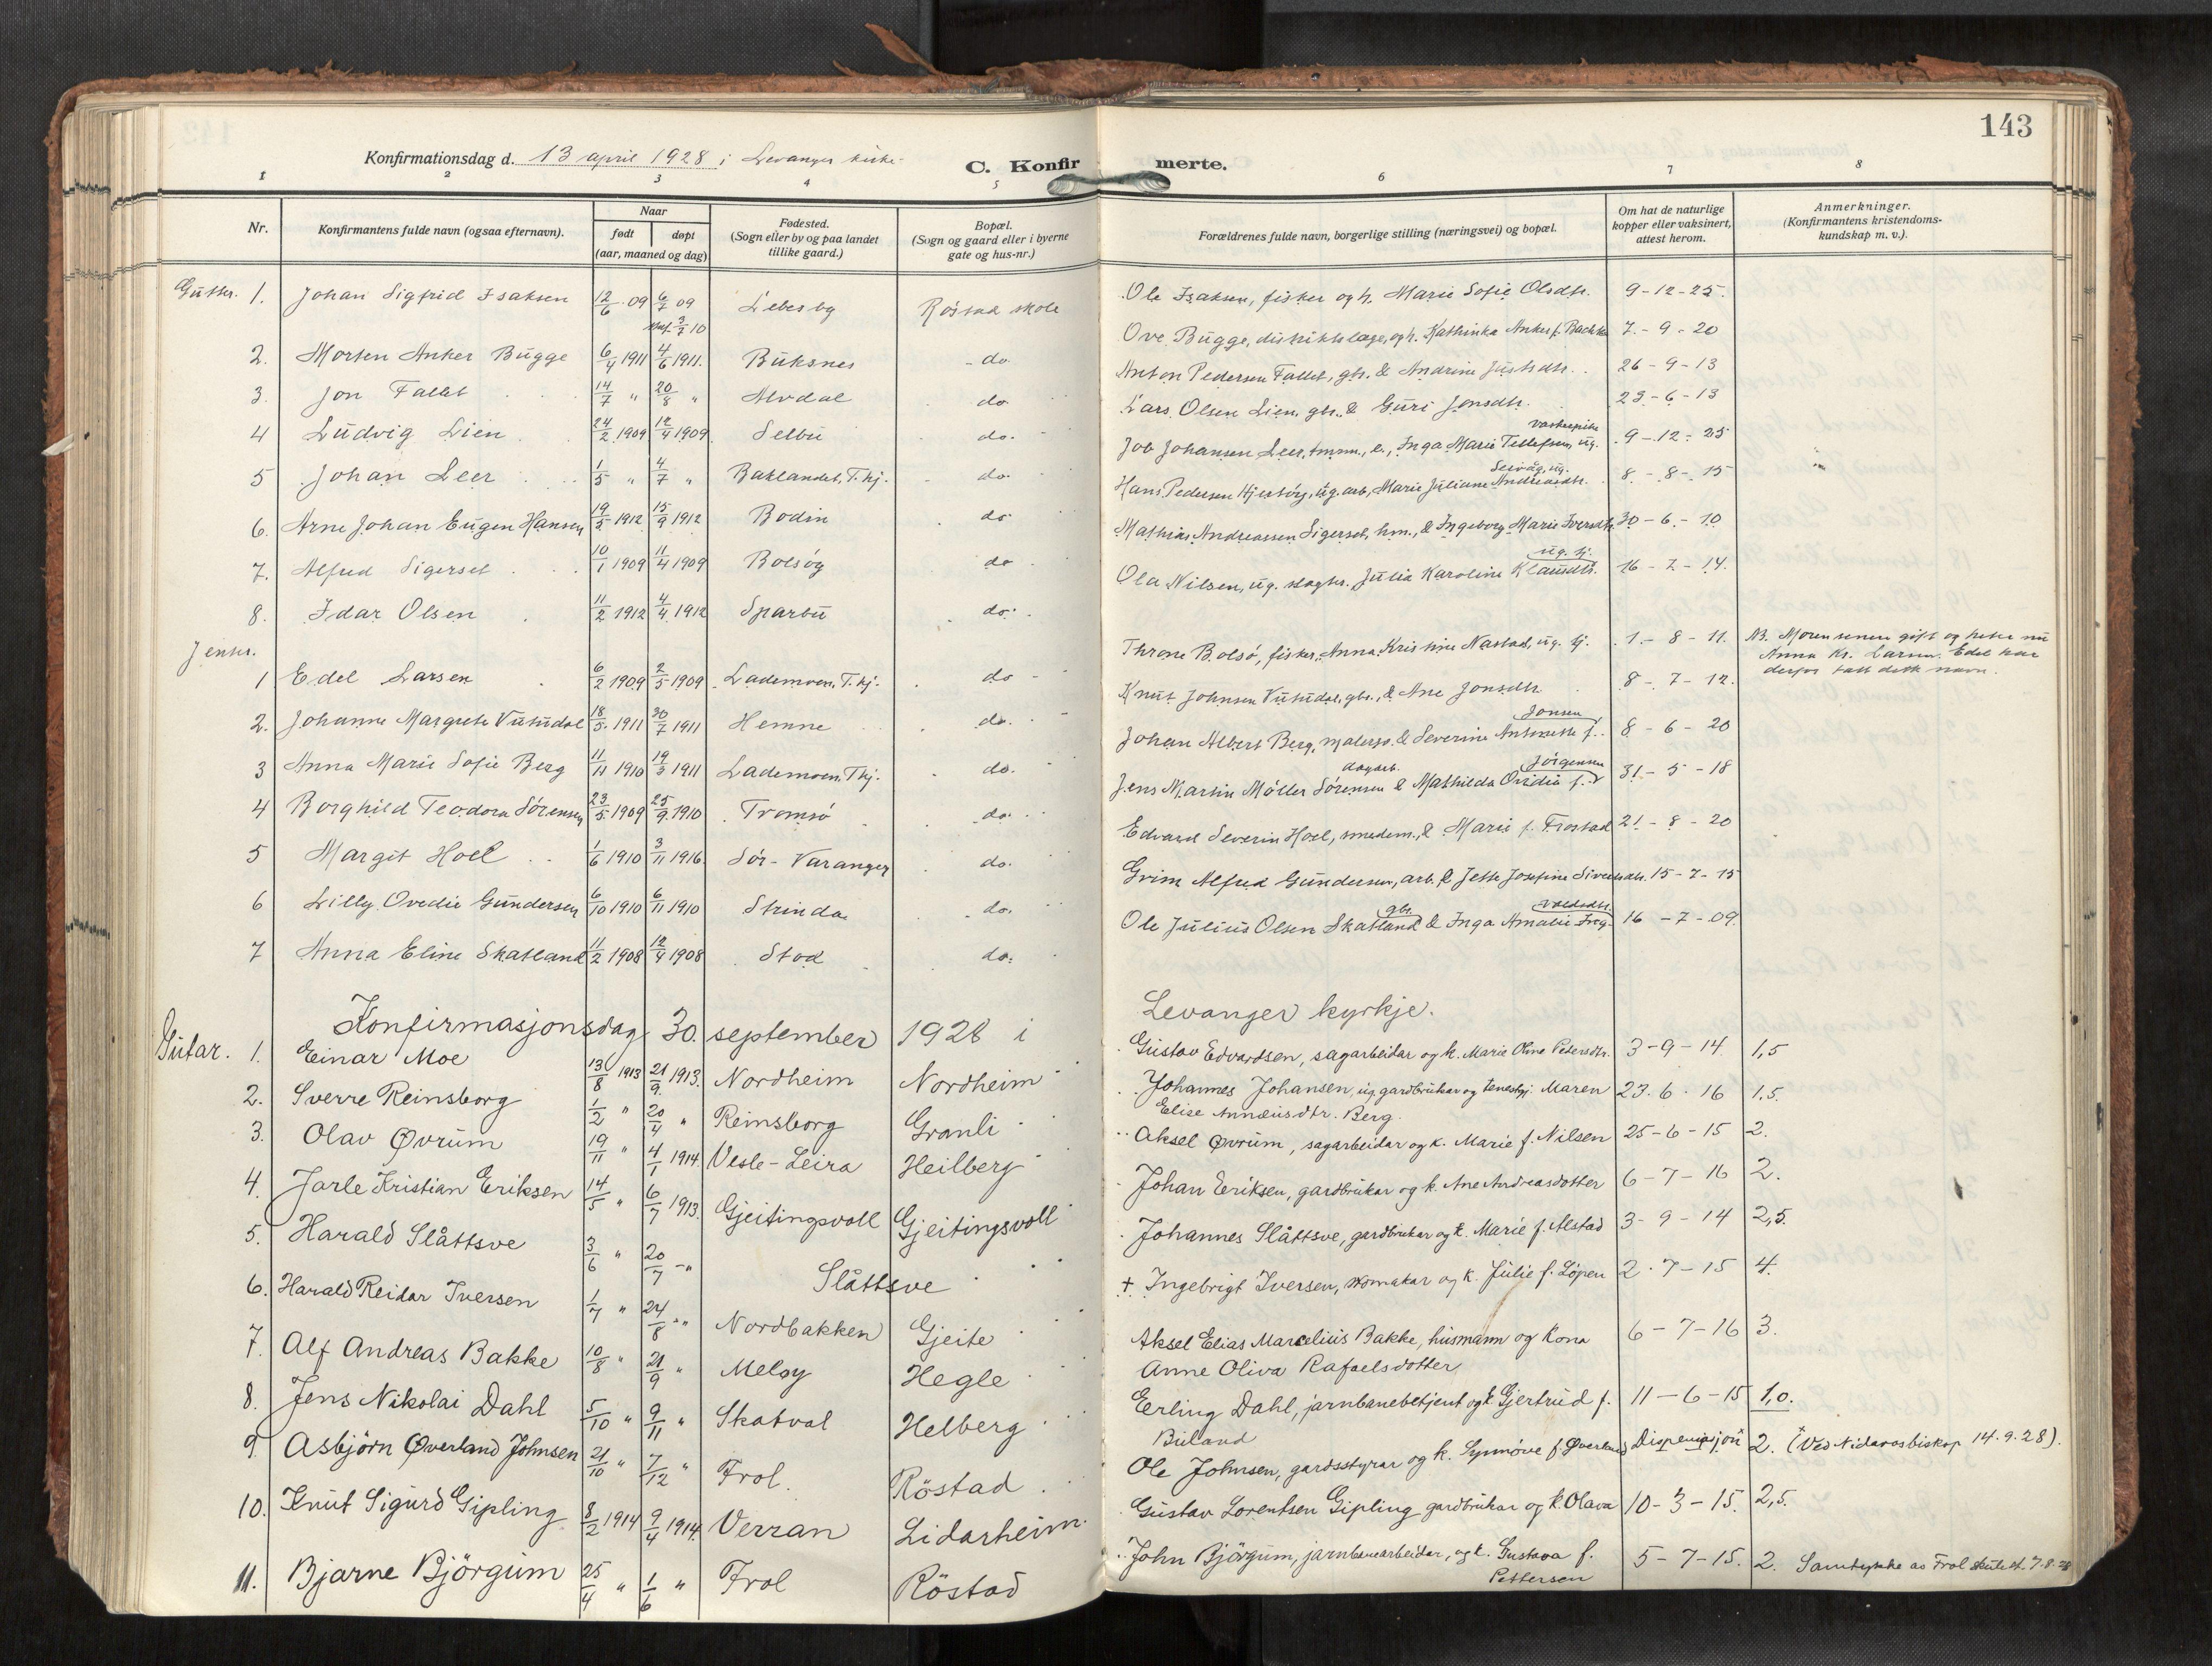 SAT, Levanger sokneprestkontor*, Parish register (official) no. 1, 1912-1935, p. 143